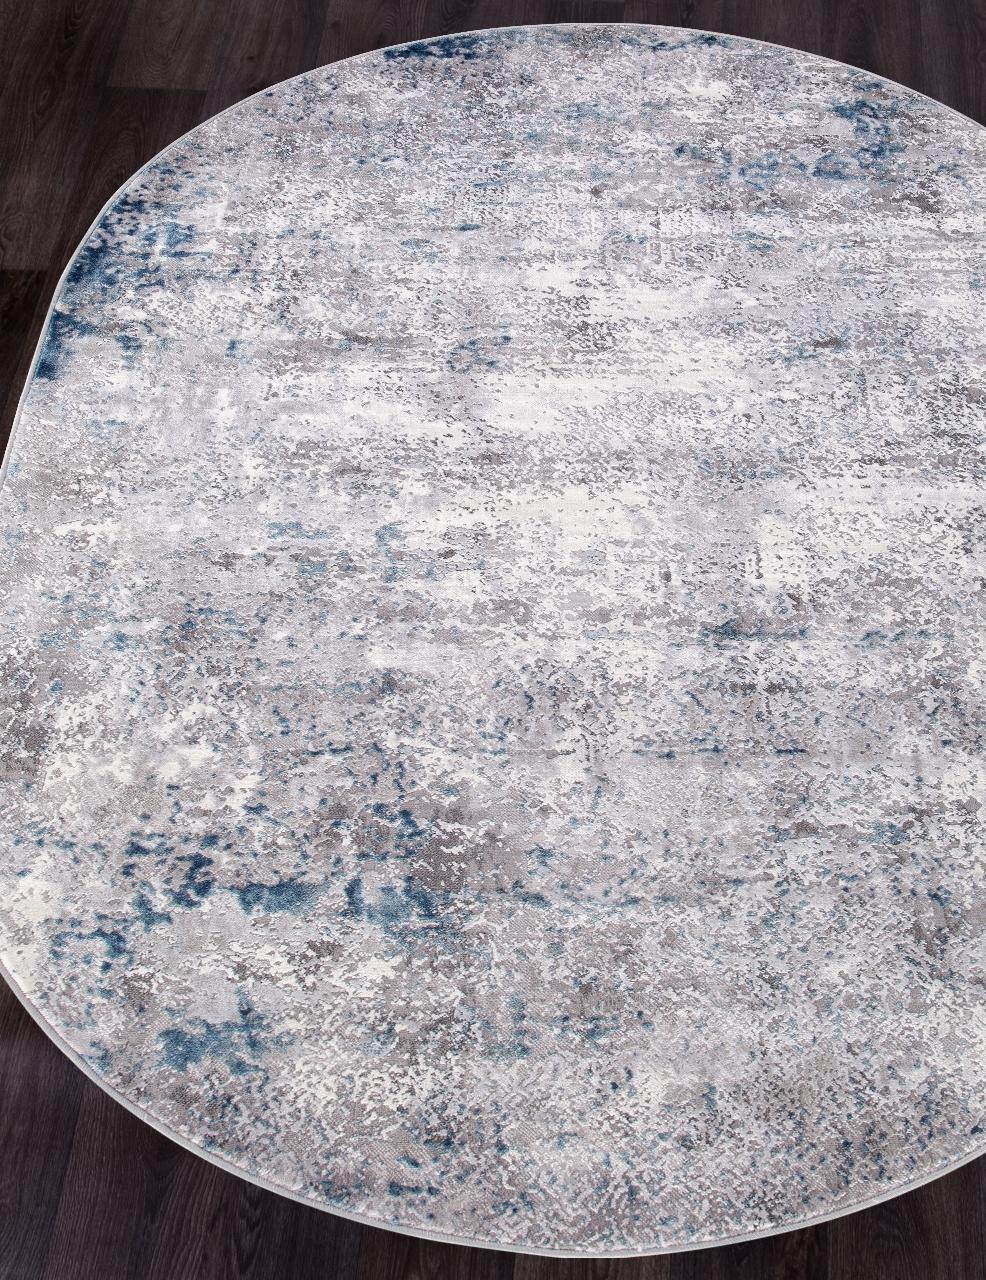 Ковер 9810 - ACIK GRI - Овал - коллекция MODA